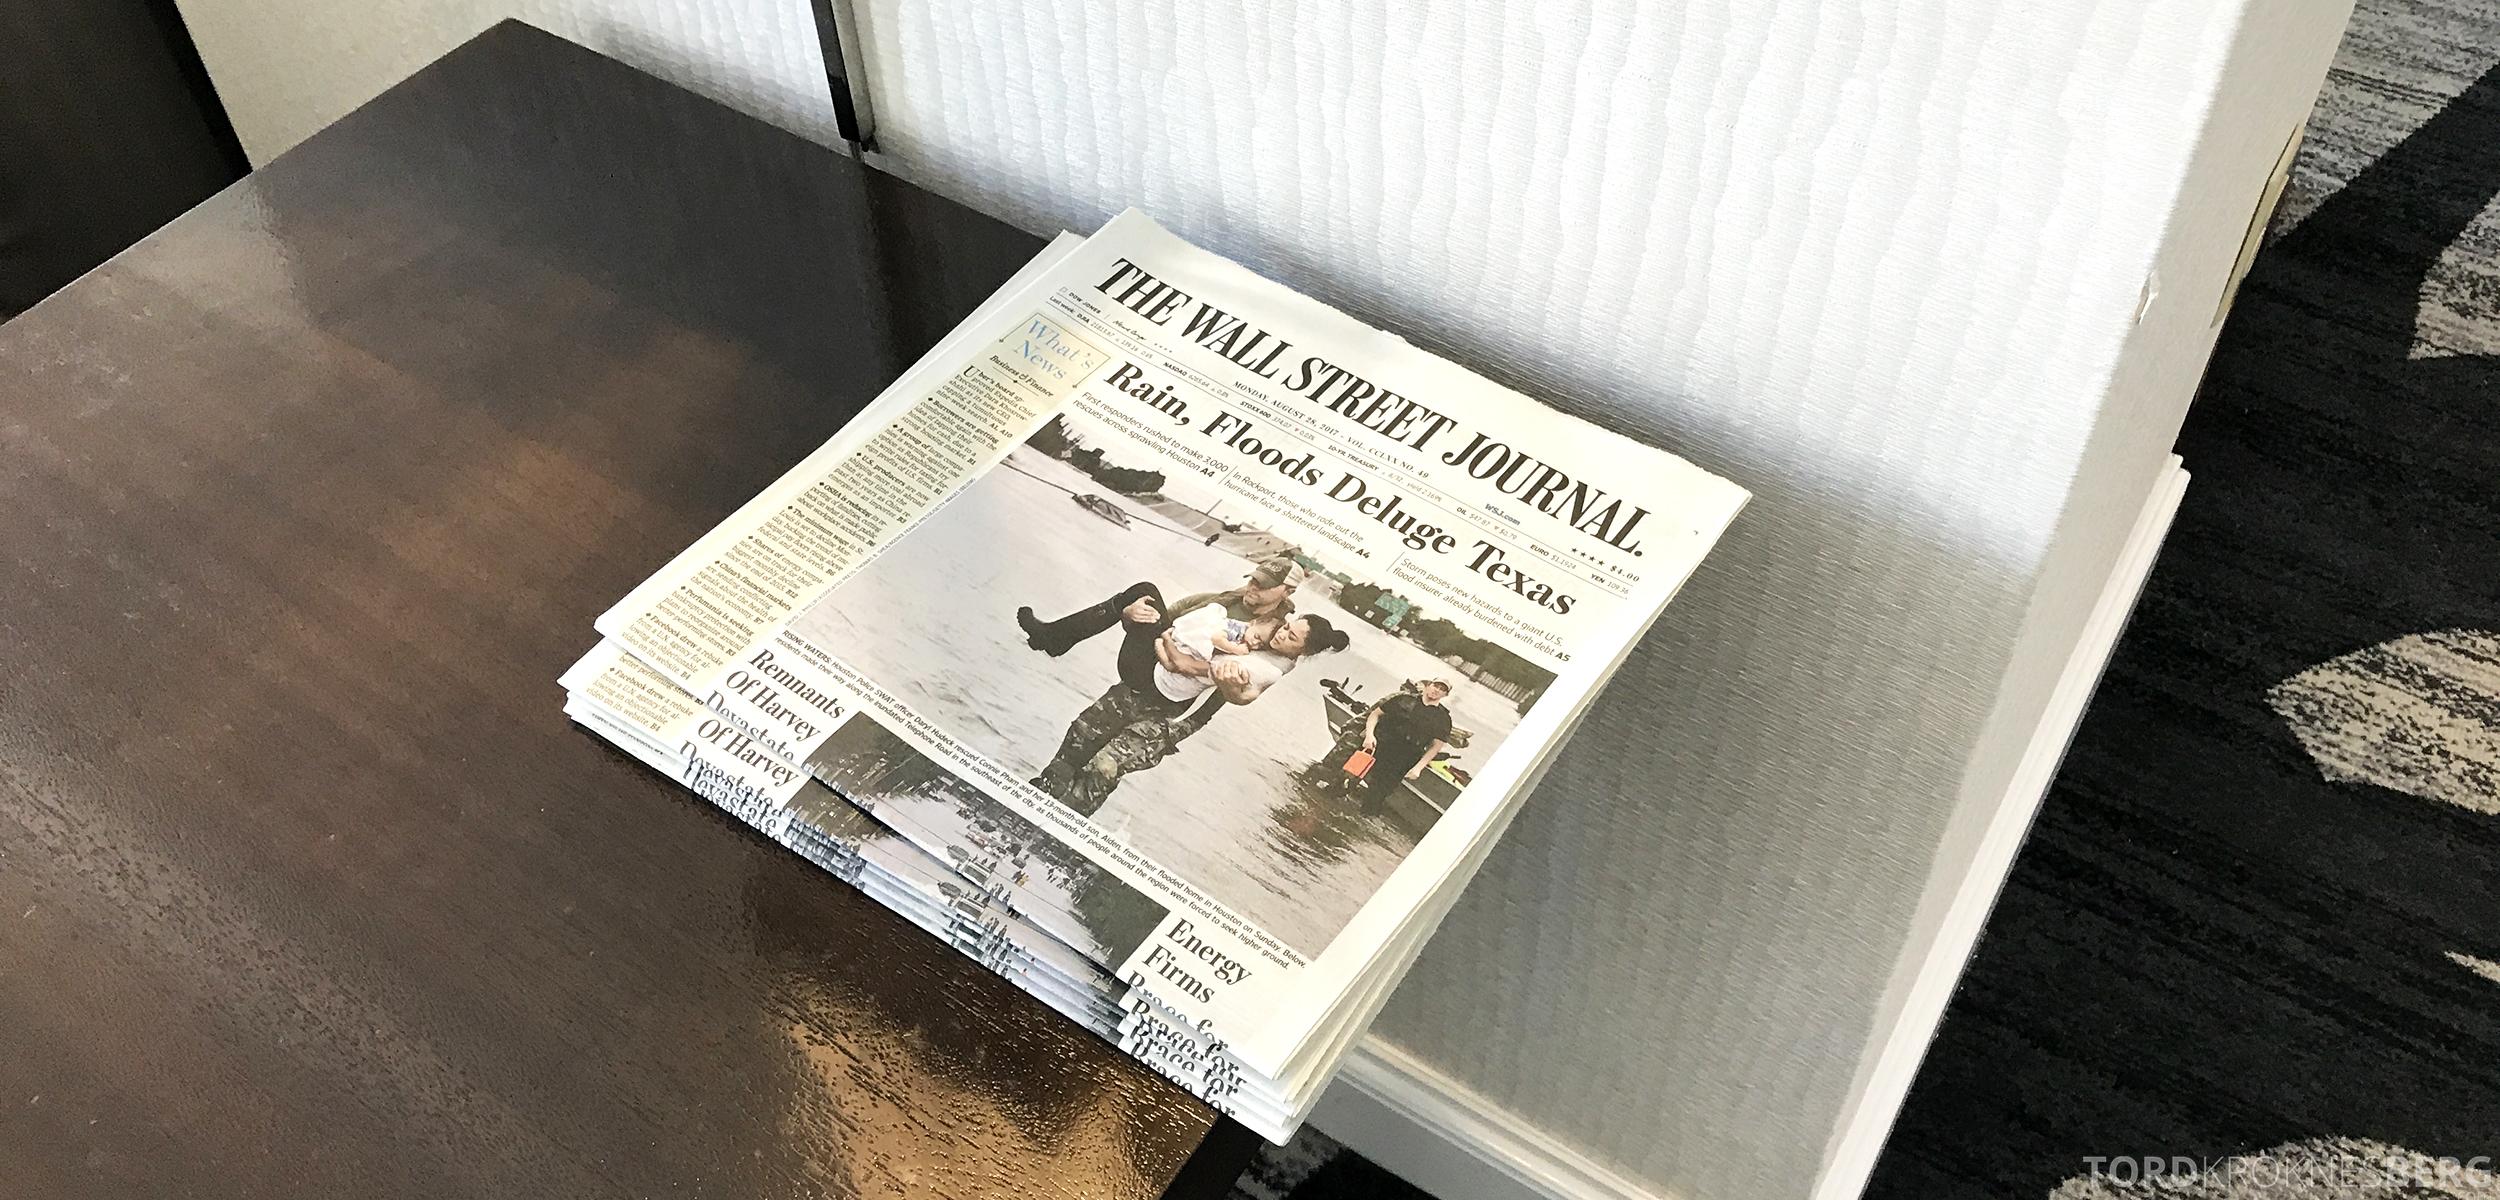 Ritz-Carlton San Francisco Hotel Club Lounge avis